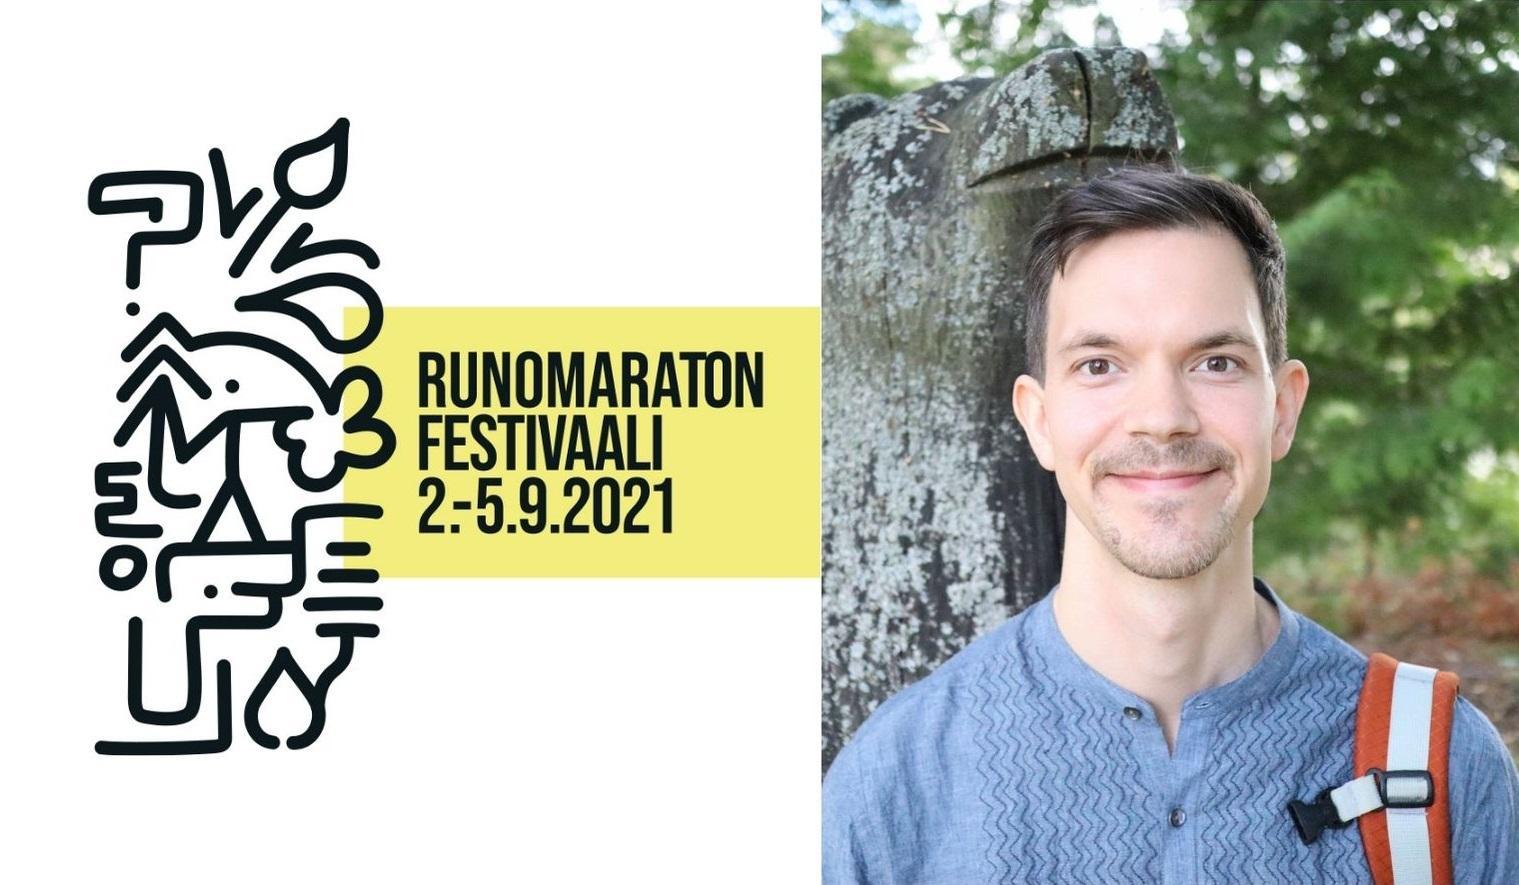 Runomaratonin logo ja Niklas Salmi.